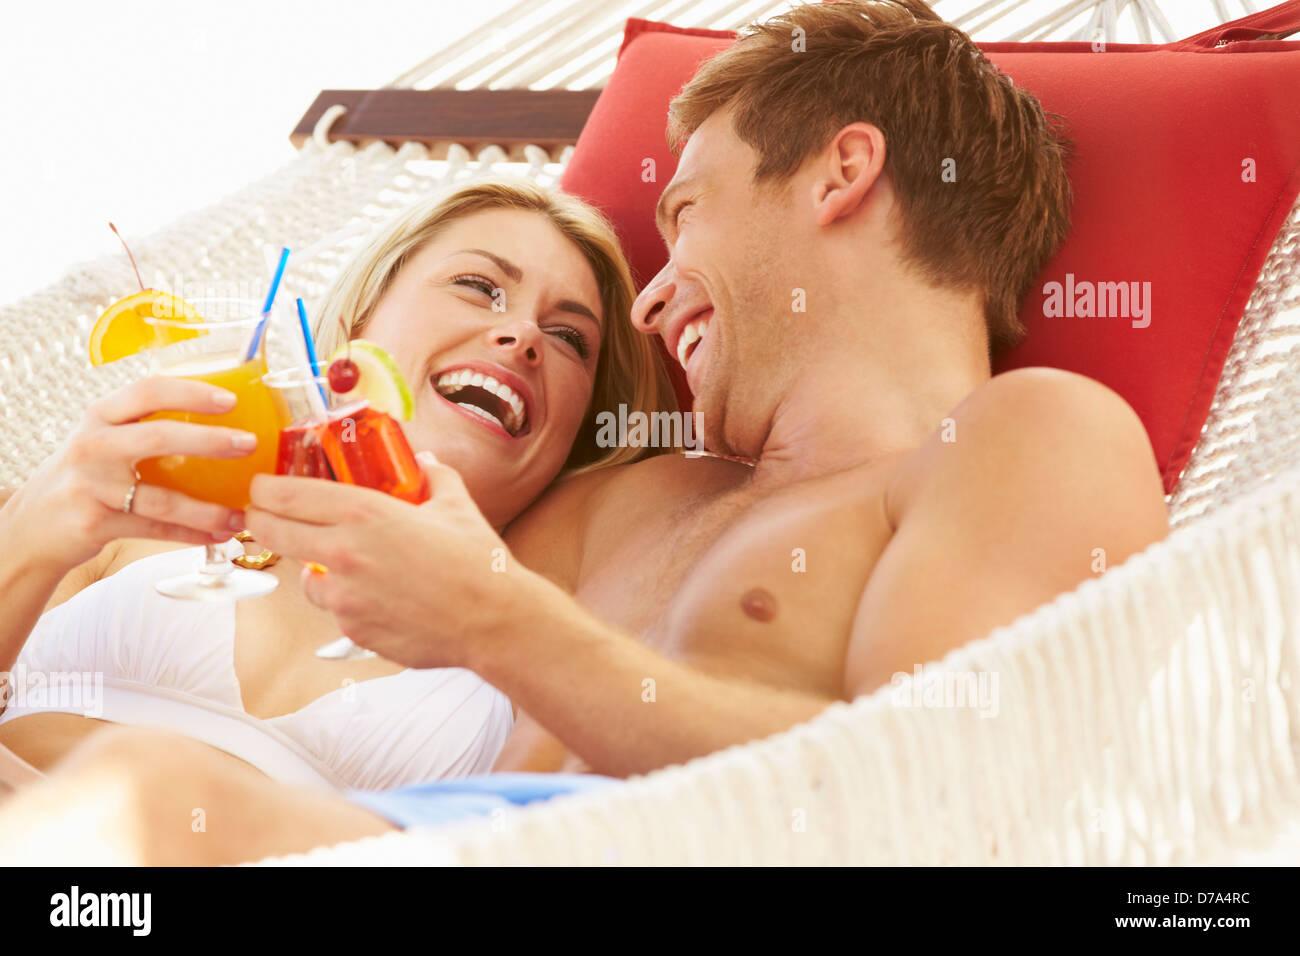 Romantic Couple Relaxing In Beach Hammock - Stock Image